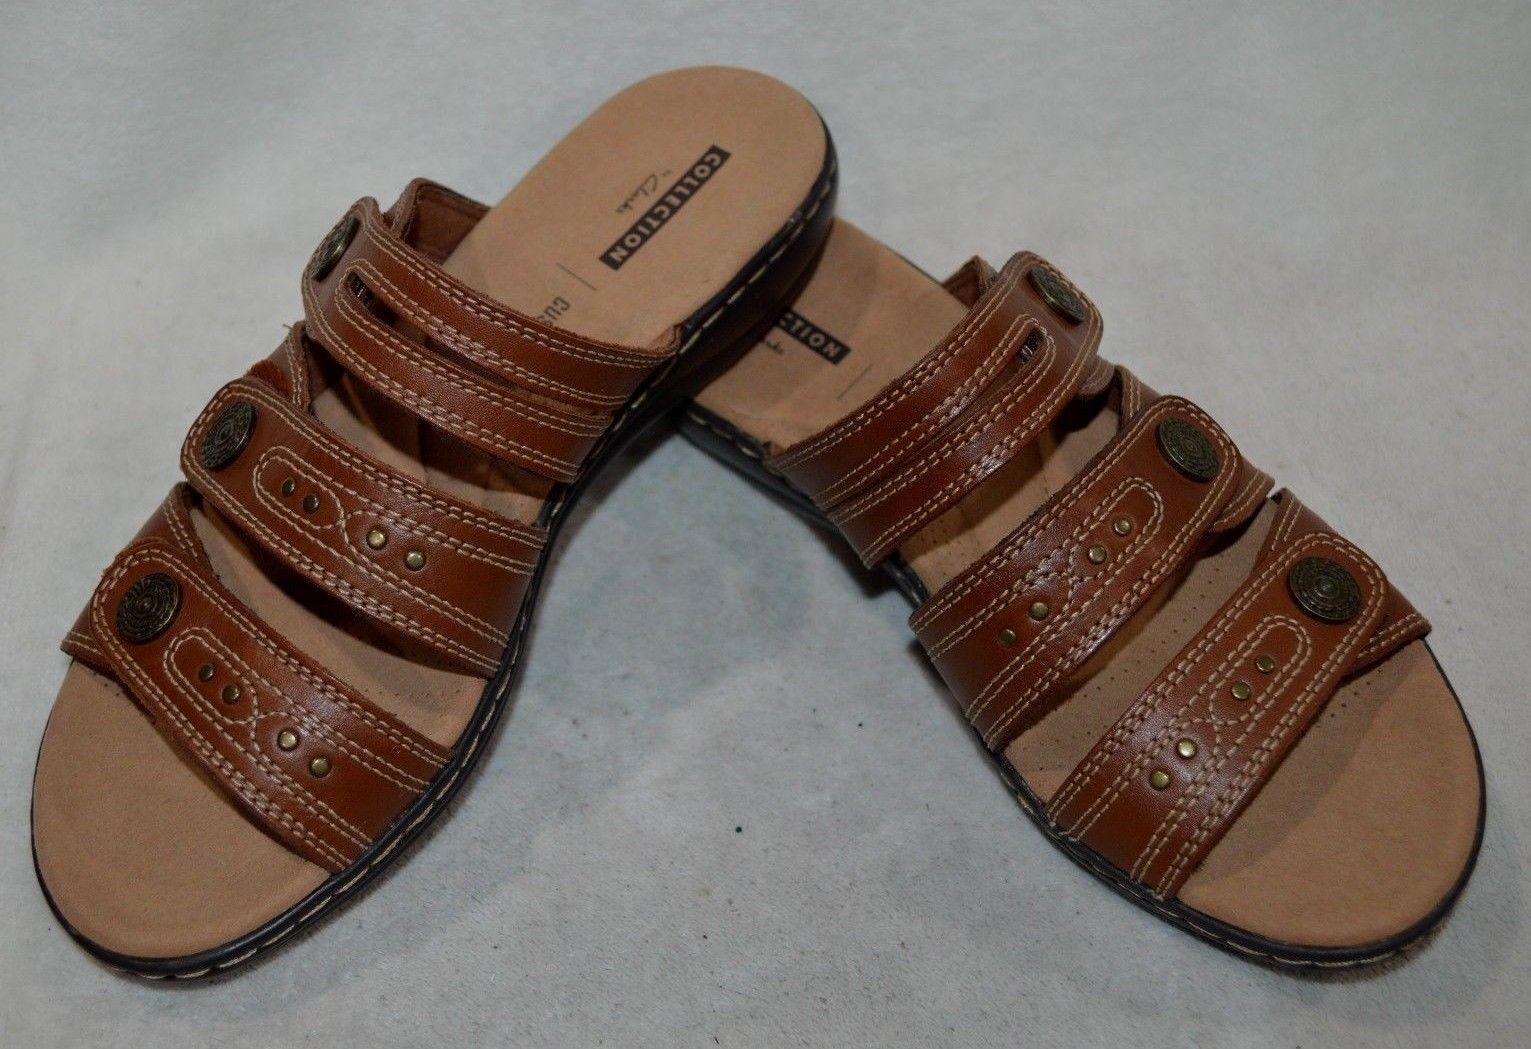 Clarks Femmes Leisa lakia Tan En Cuir Marron Sandale-Tailles 6.5 7.5 10 nwb